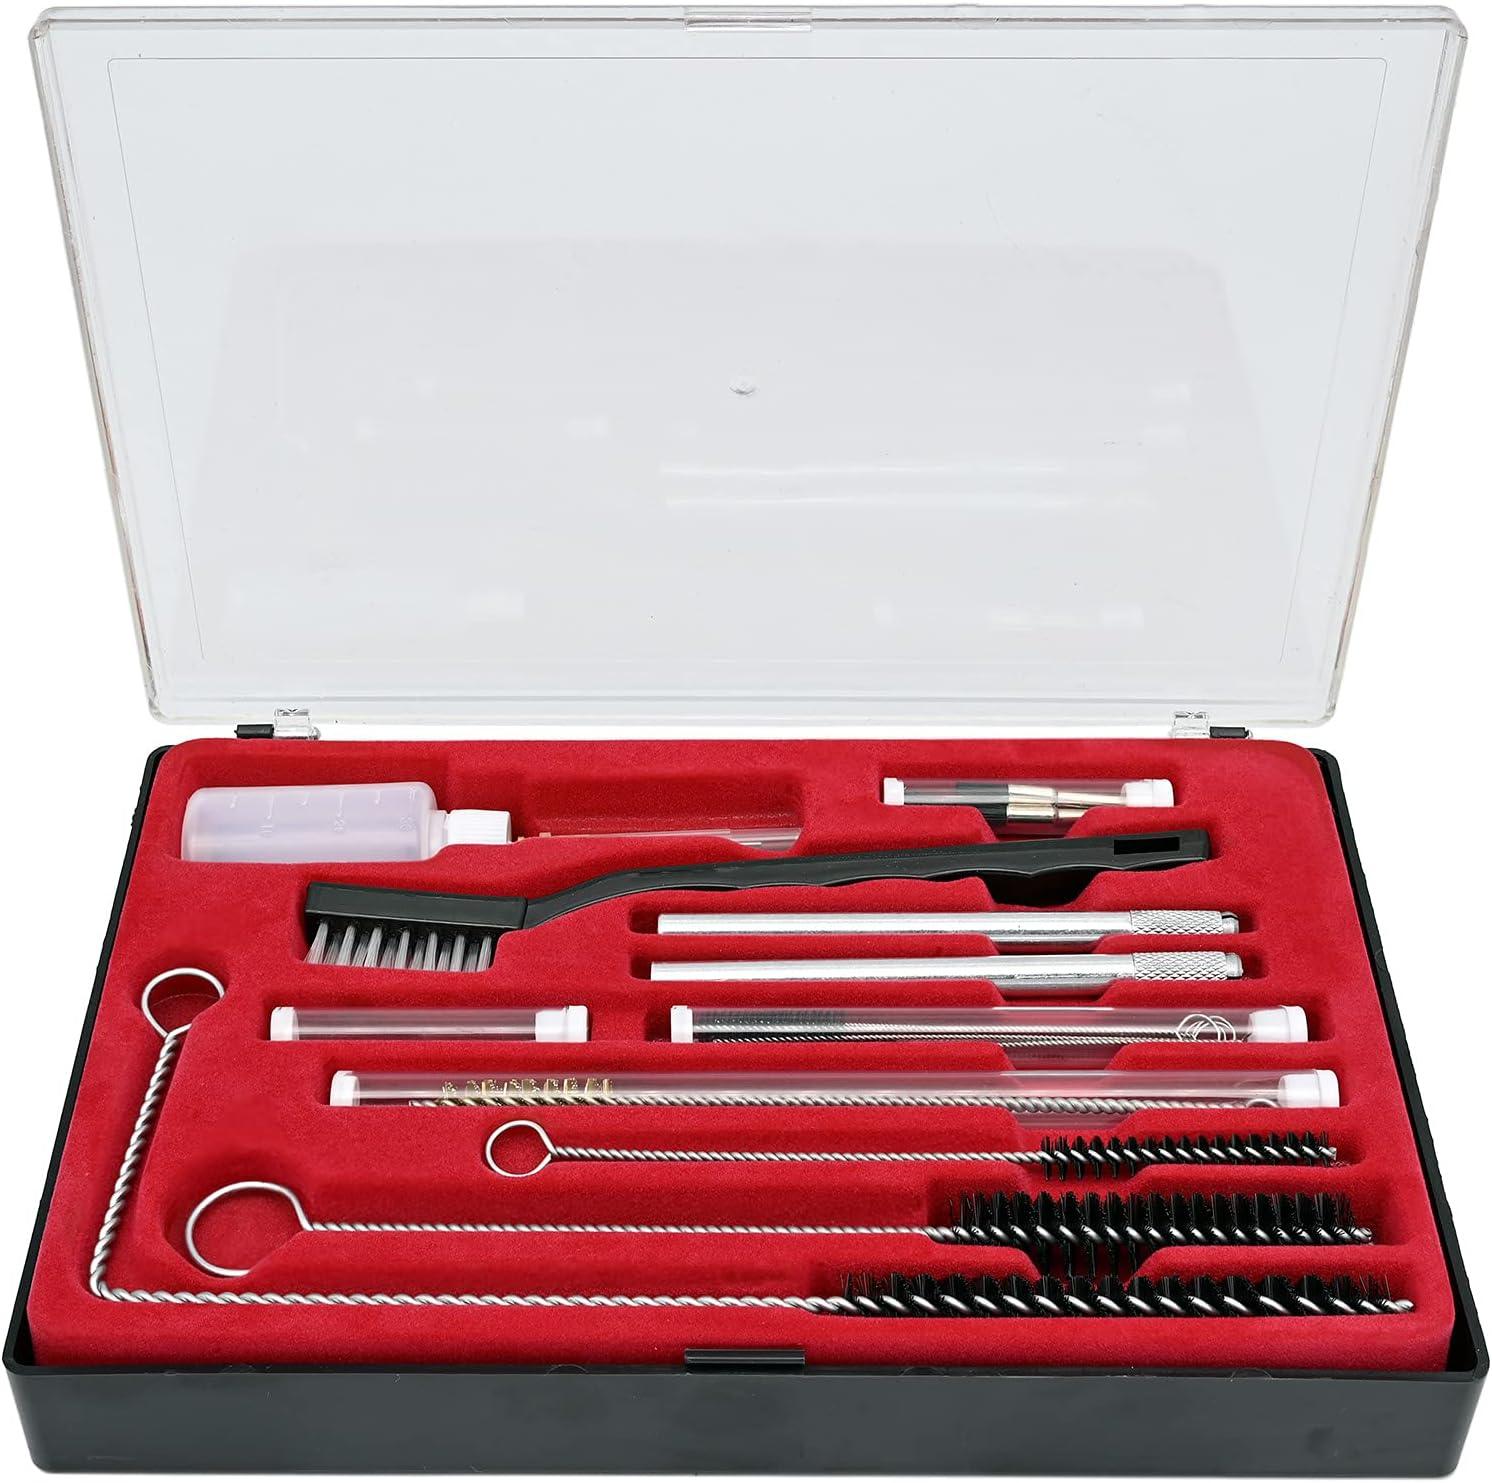 Austin Mall BOWD Paint Gun Max 76% OFF Cleaning Kit G HVLP Airbrush Spray